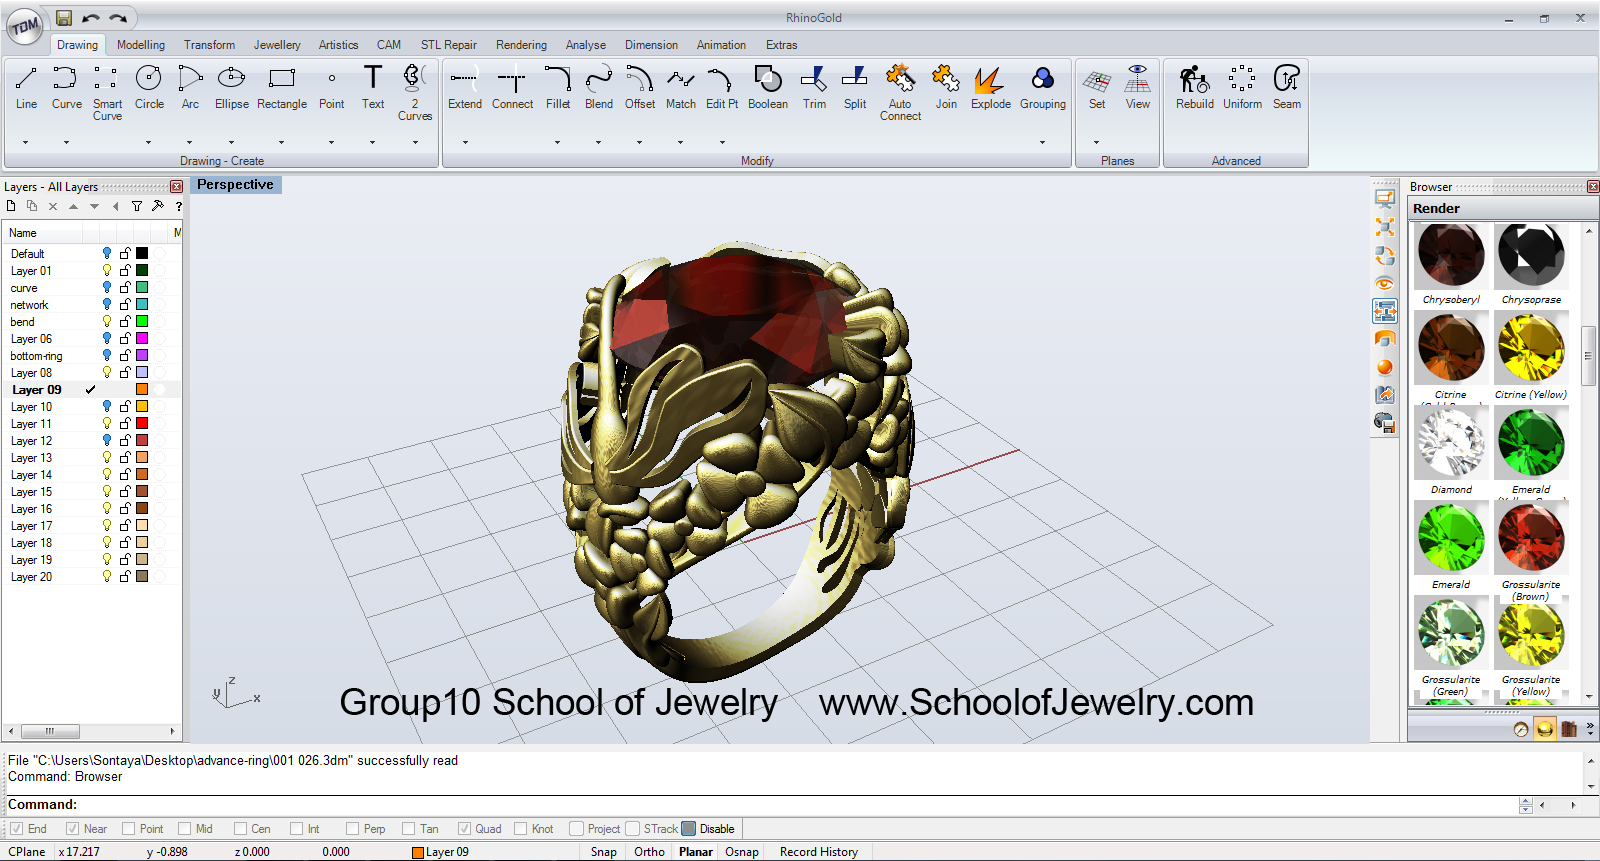 Group10-school of jewelry ,โรงเรียนสอนออกแบบเครื่องประดับ